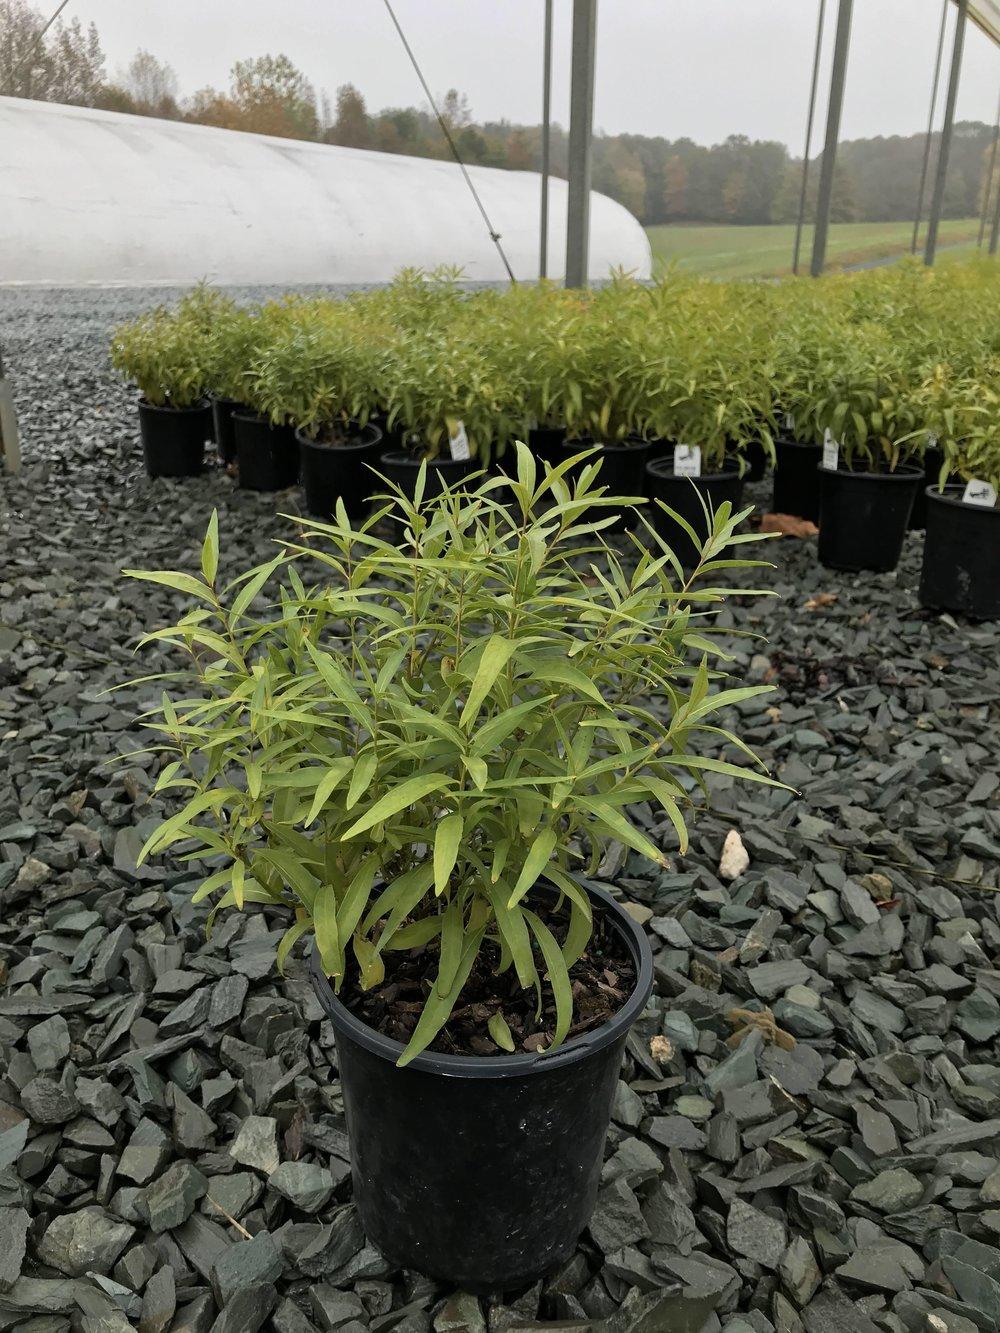 Amsonia tabernaemontana salicifolia, Eastern Bluestar 1g